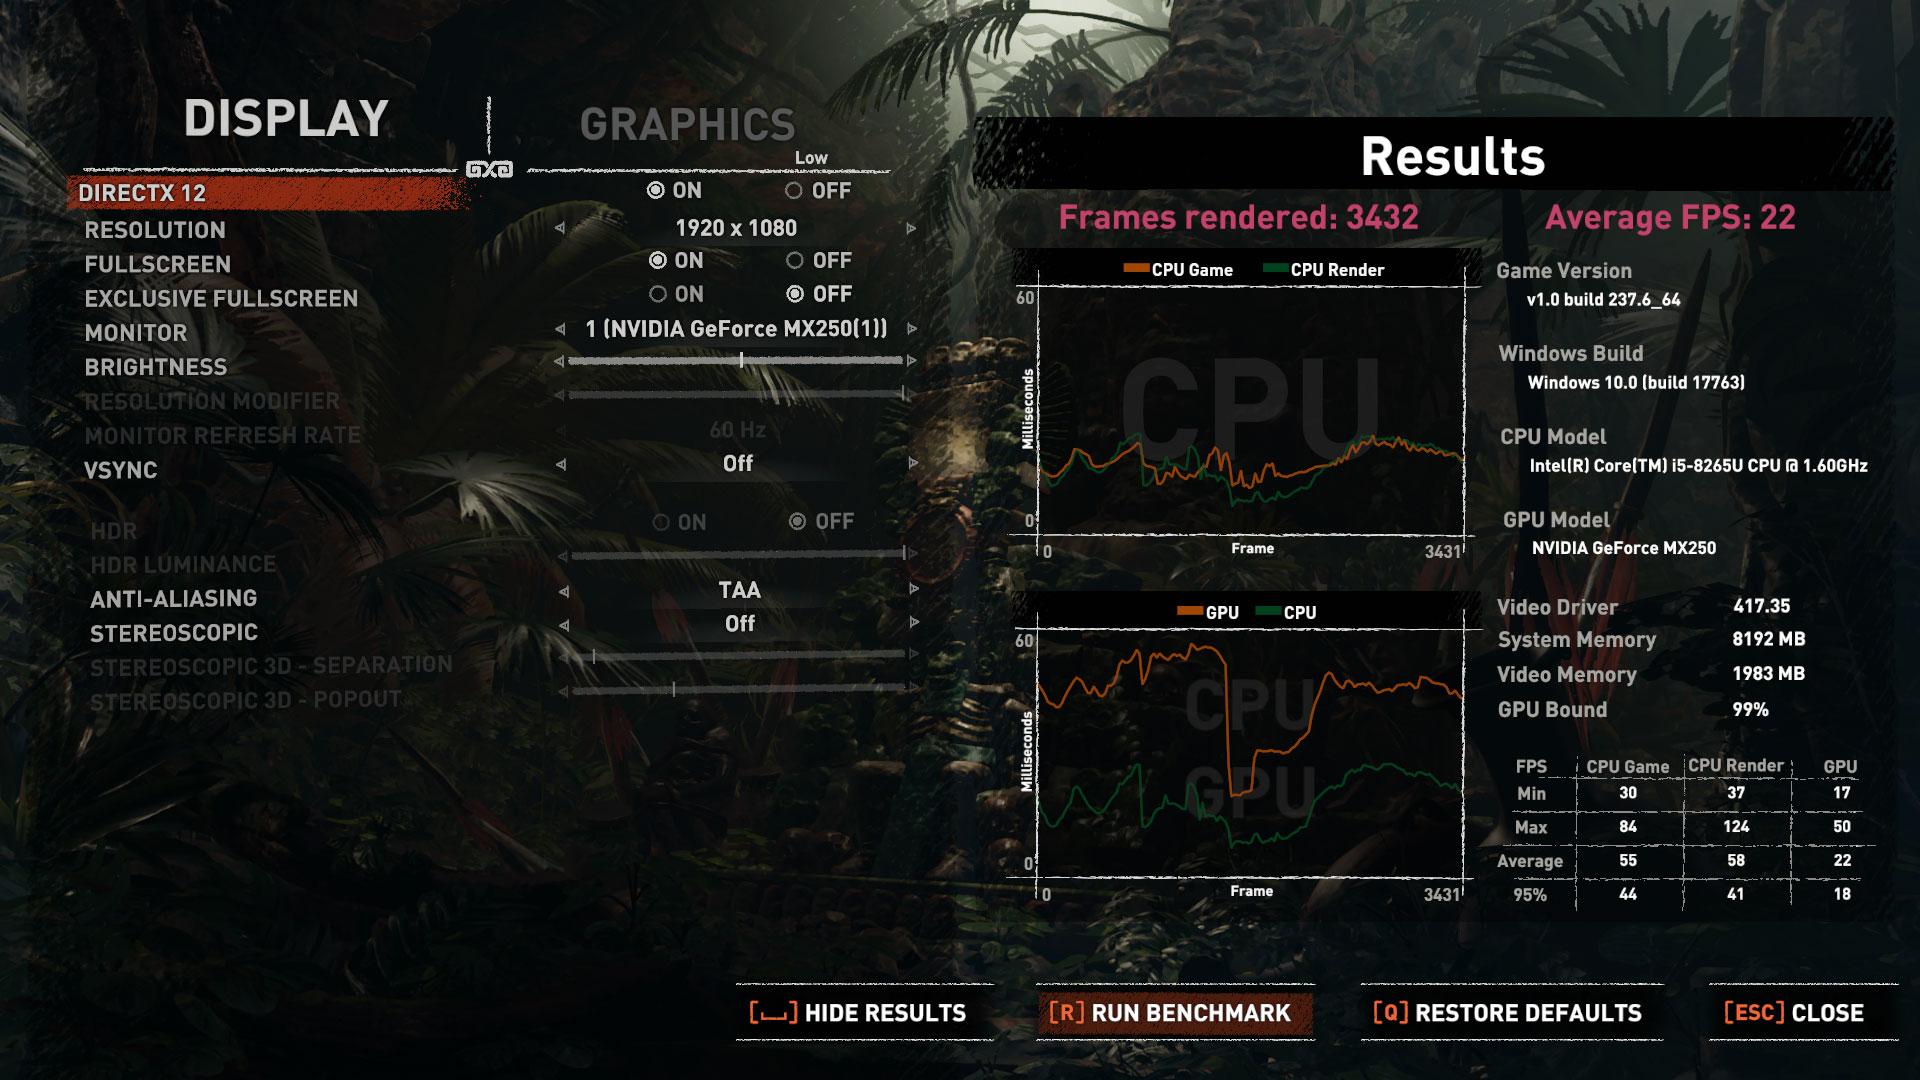 Nvidia GeForce MX250 (1D13or 1D52) benchmarks vs GeForce MX150